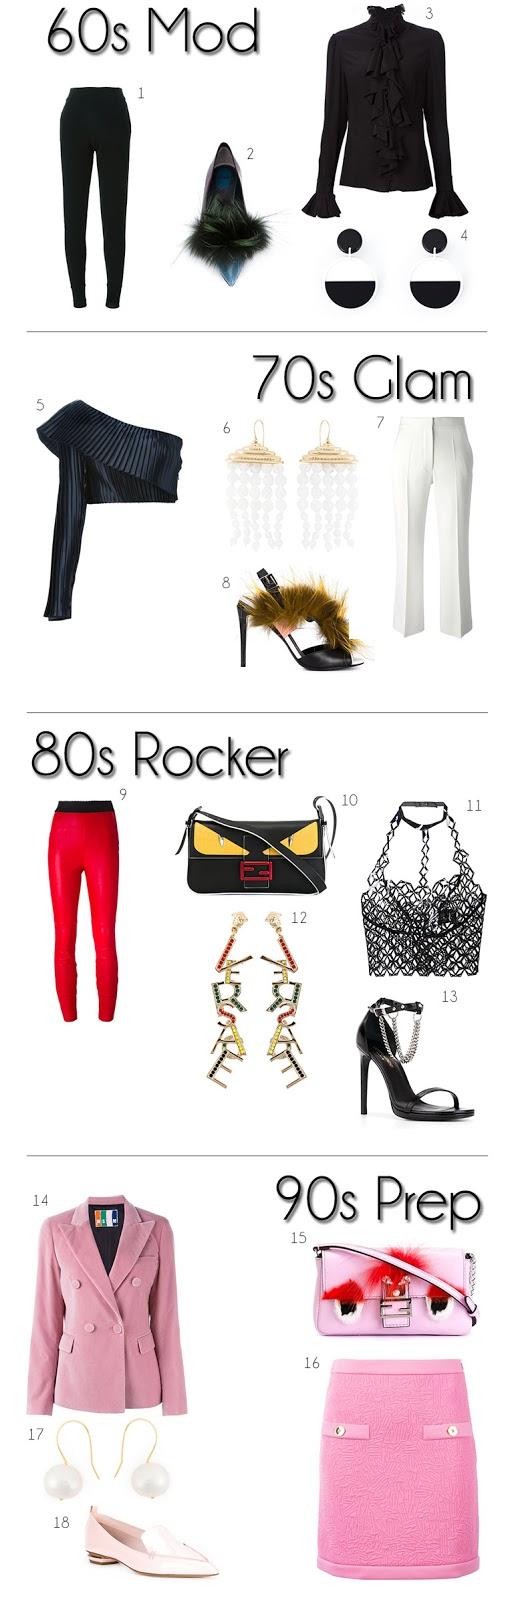 60s mod Halloween costume, 70s glam  Halloween costume, 80s rocker  Halloween costume, 90s prep  Halloween costume